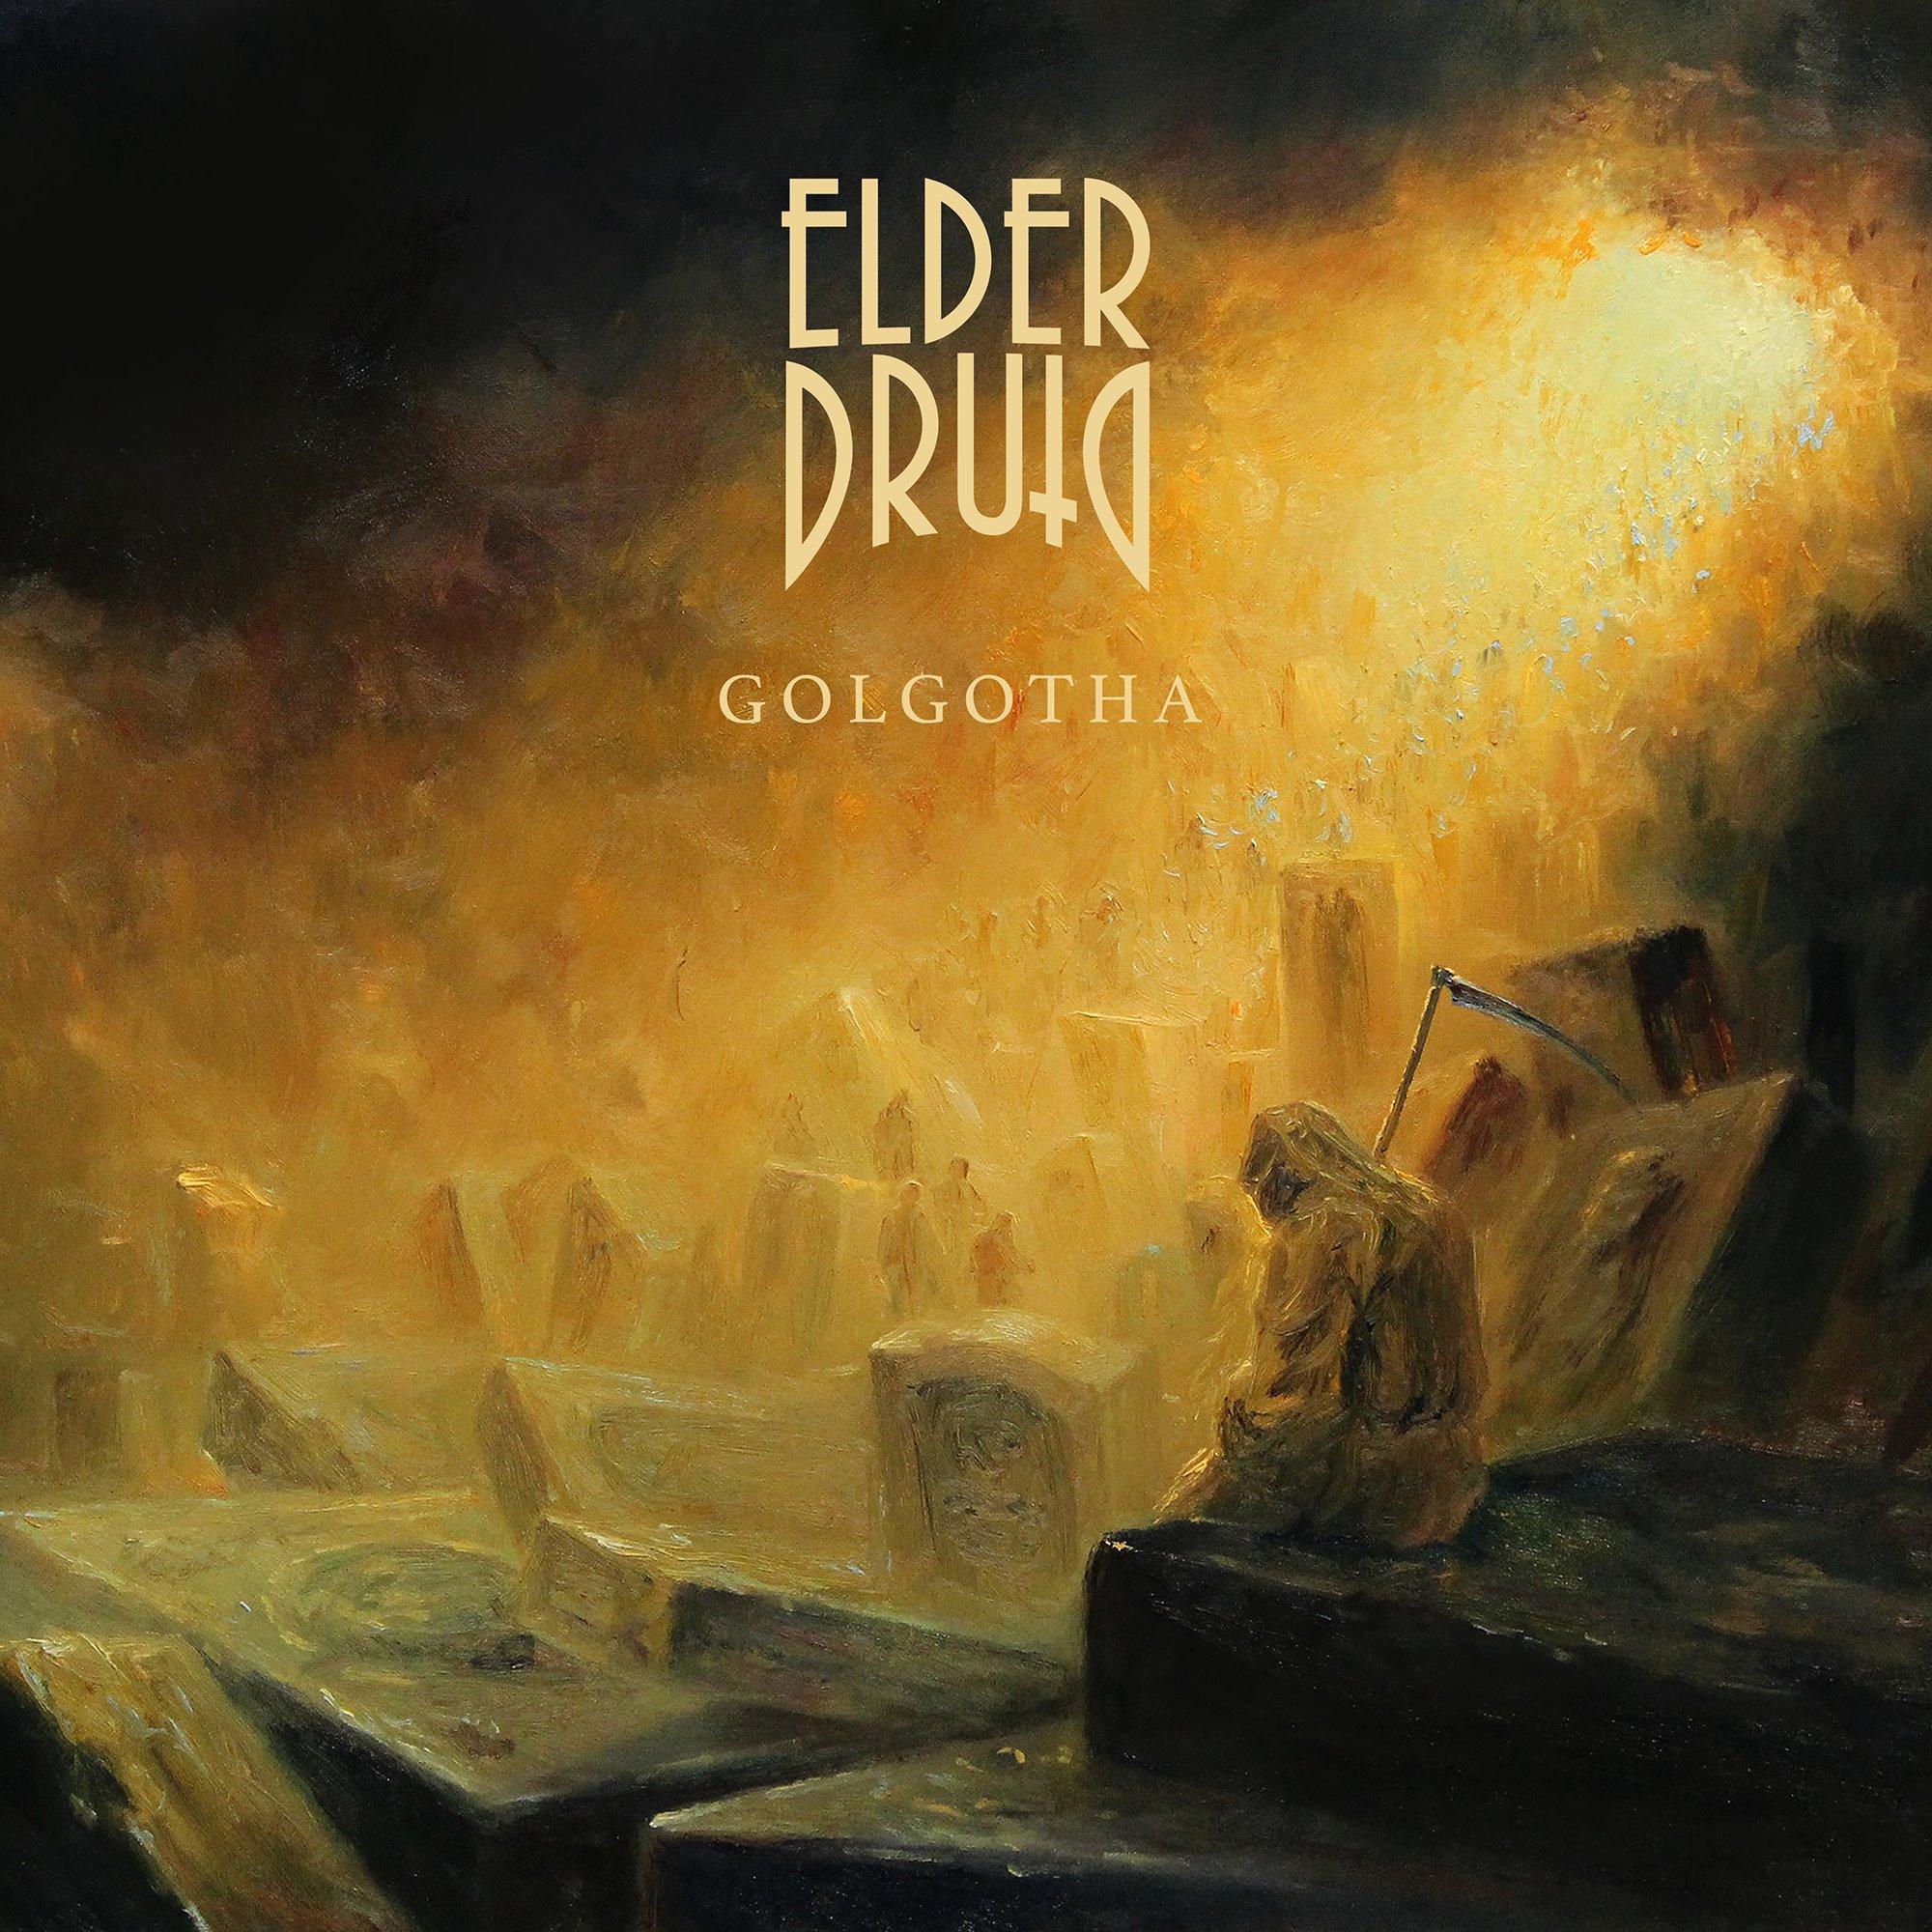 elder druid golgotha